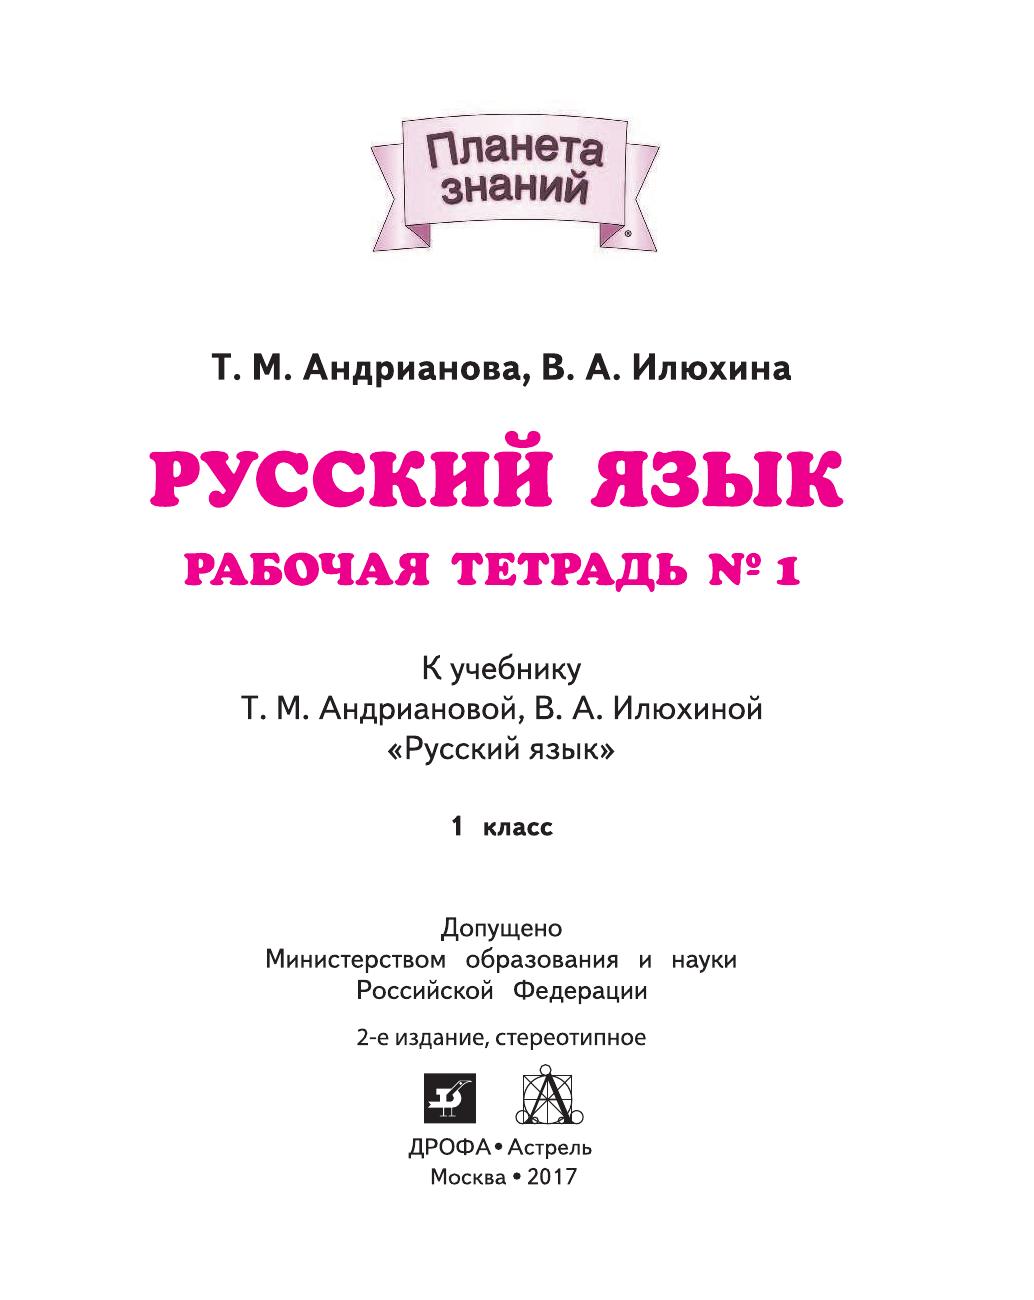 1 знаний язык андрианова гдз класс русский планета